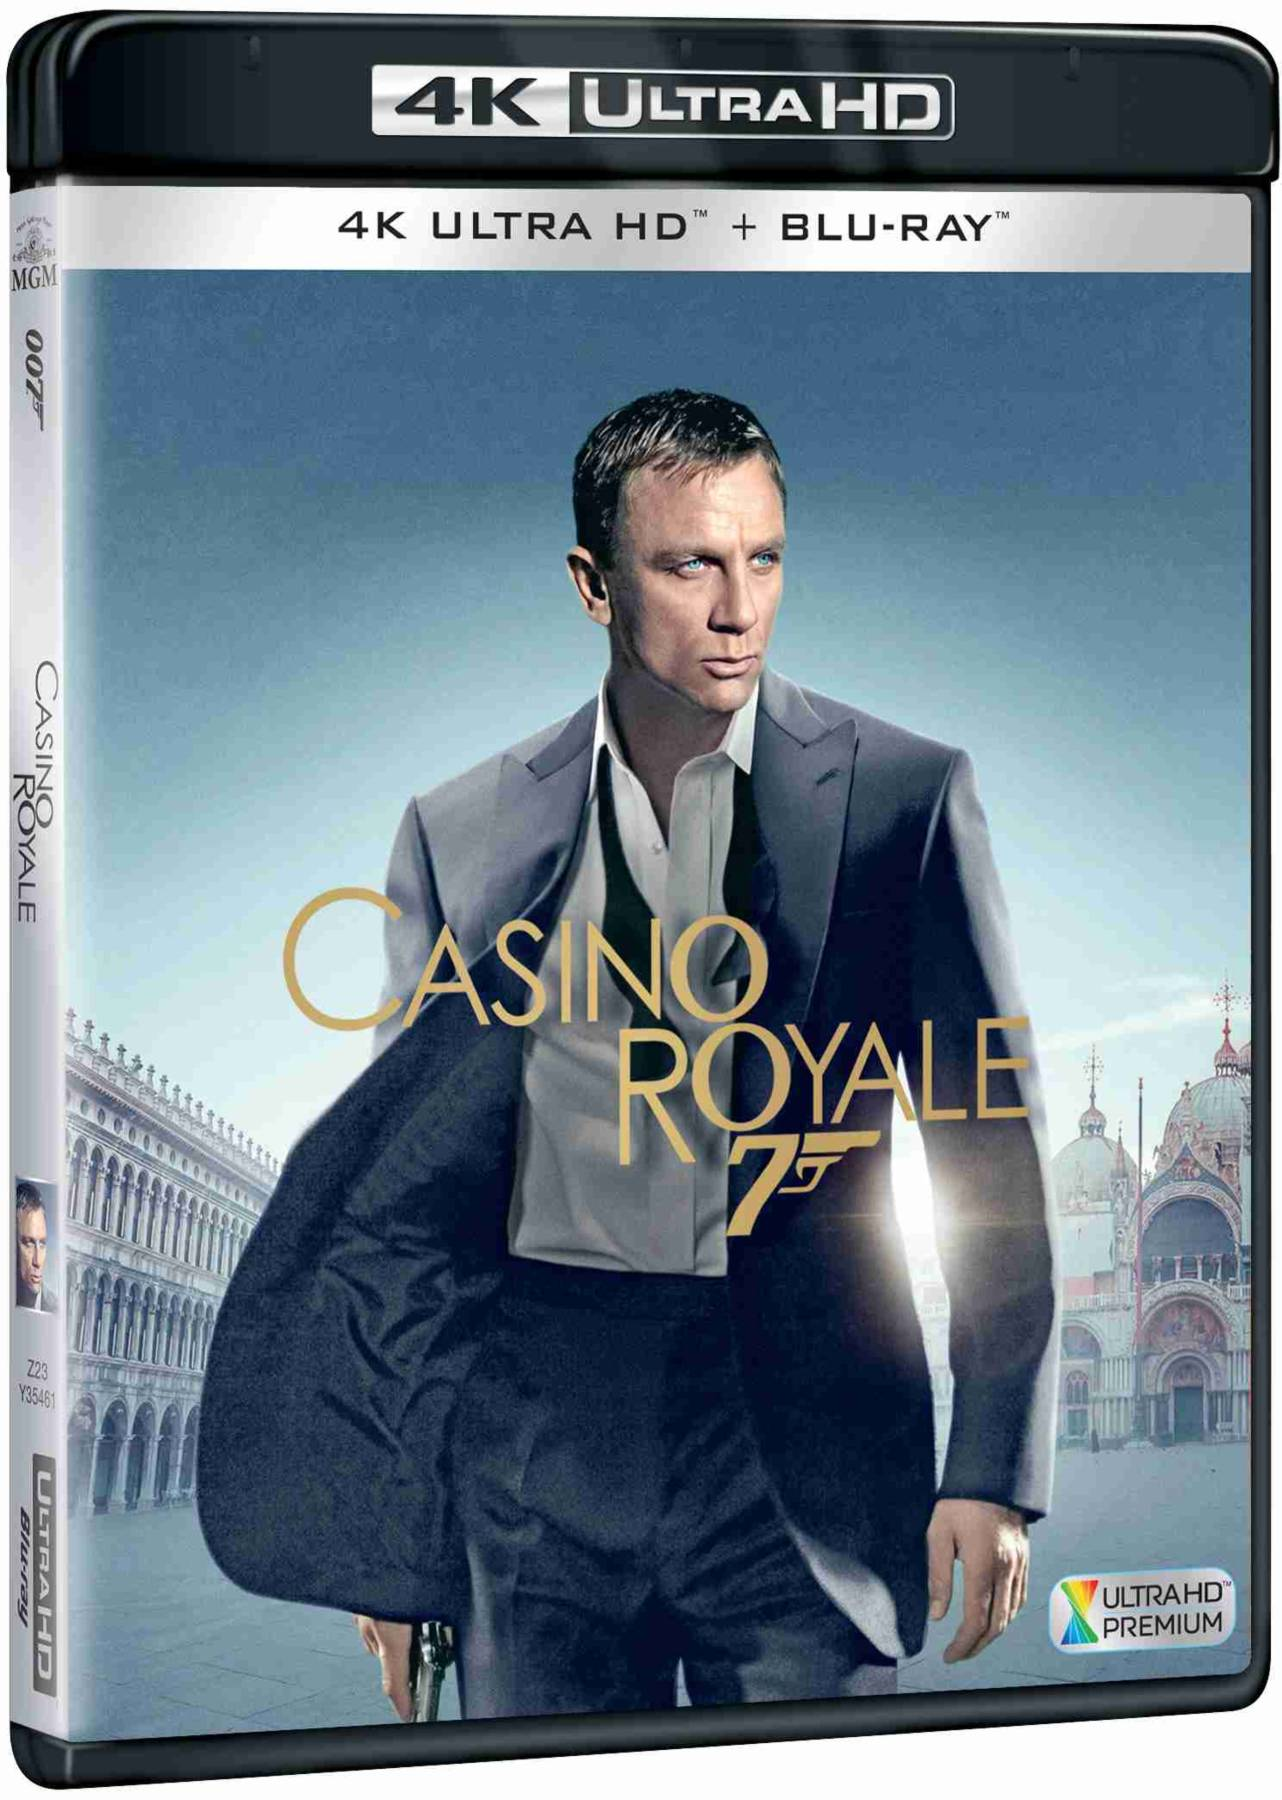 Casino Royale (4K Ultra HD) - UHD Blu-ray + Blu-ray (2 BD)